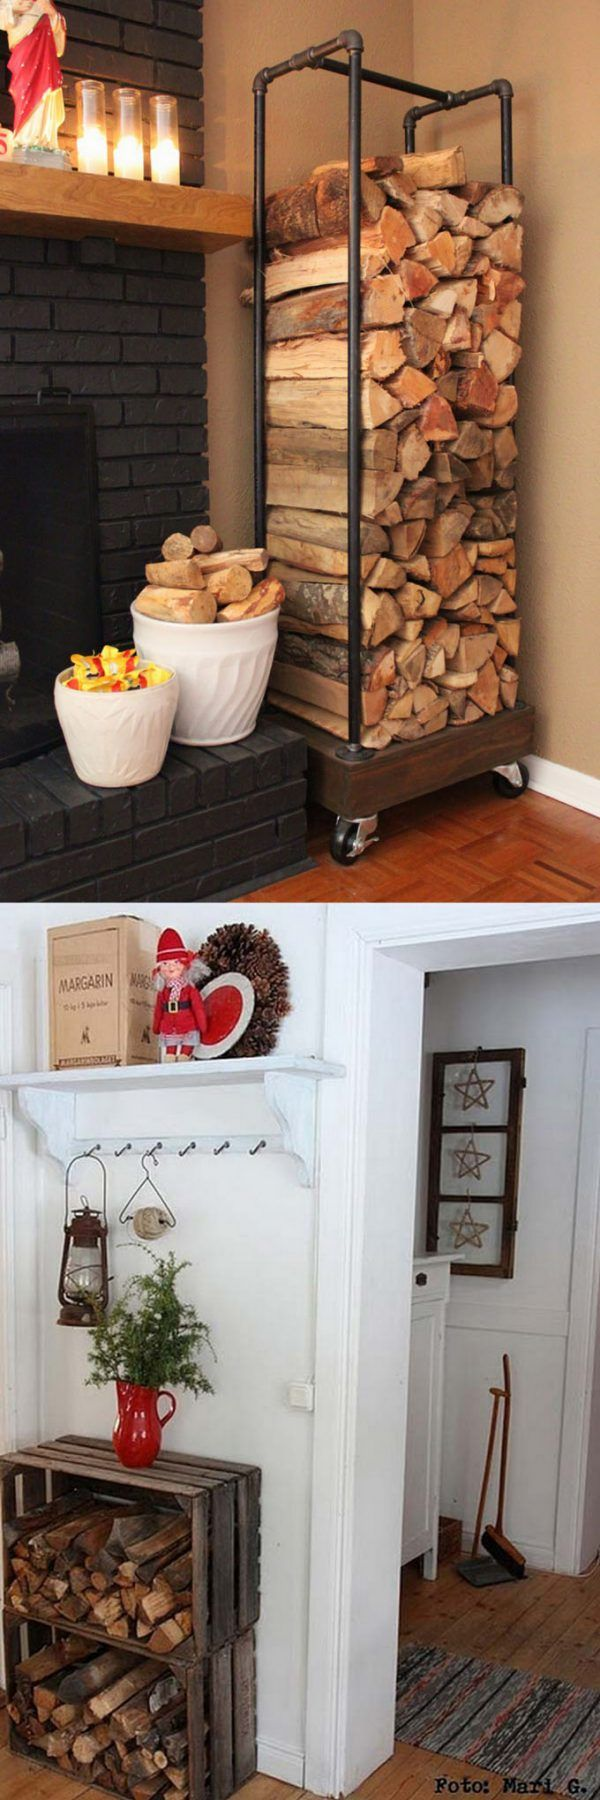 15-firewood-rack-storage-ideas-apieceofrainbow-7